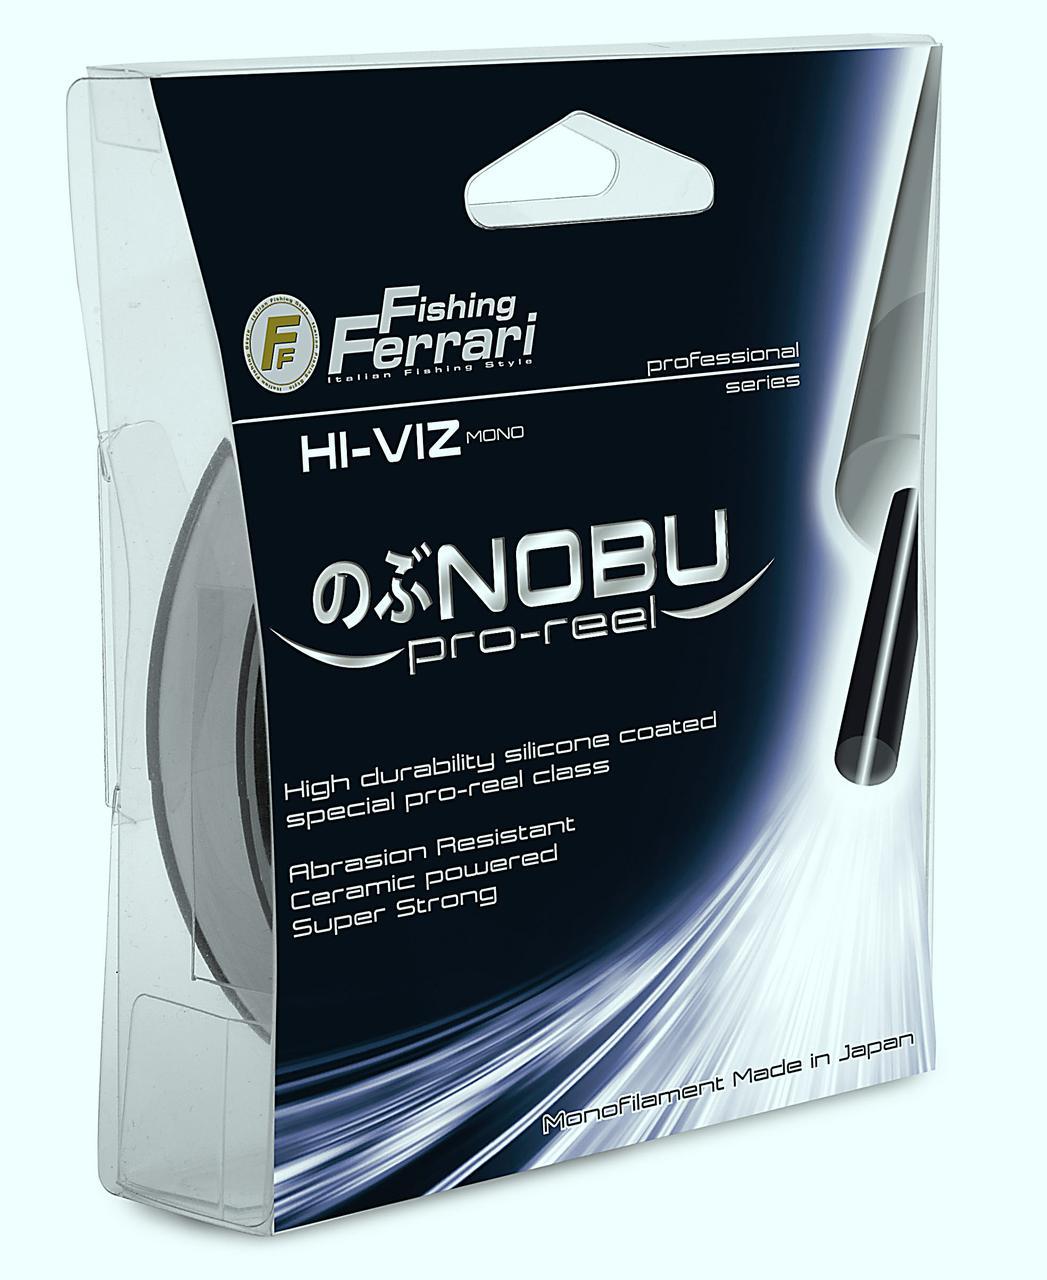 Леска Lineaeffe FF NOBU  Pro Reel 0.285мм 150м. FishTest-12,00кг Sand Special (серый)  Made in Japan